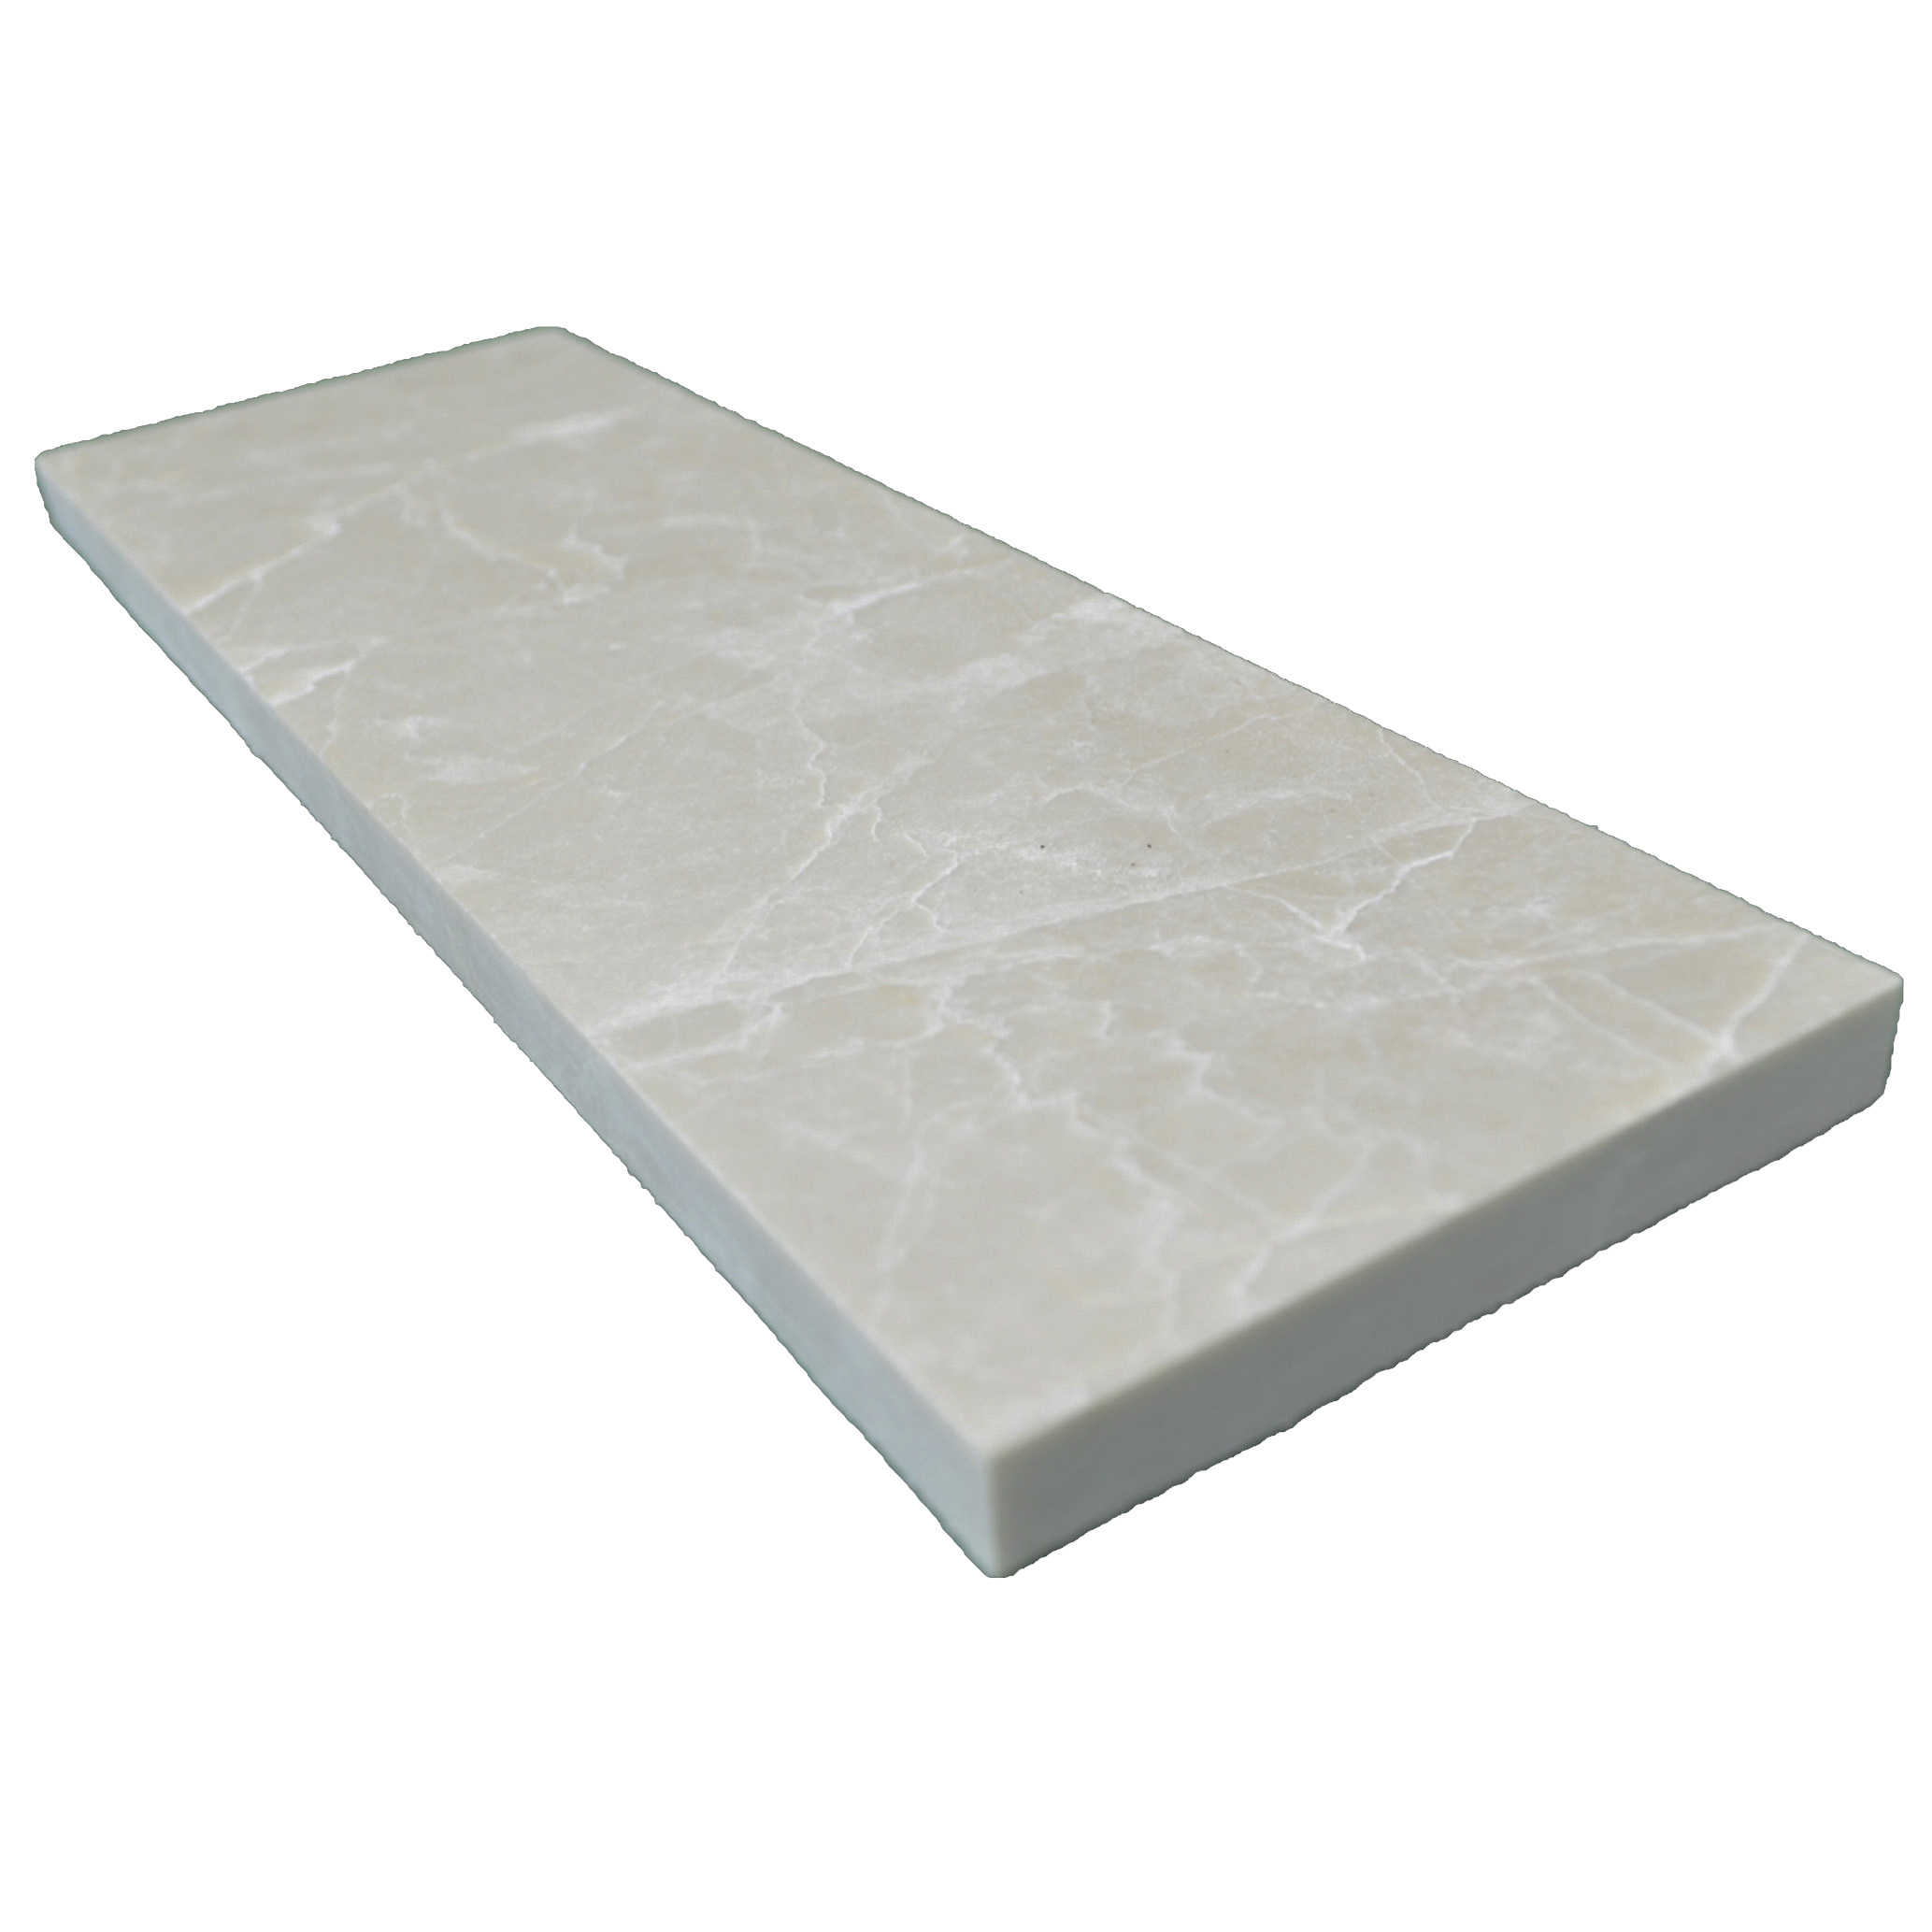 Botticino Beige Polished Marble Tiles 4x12 (2)